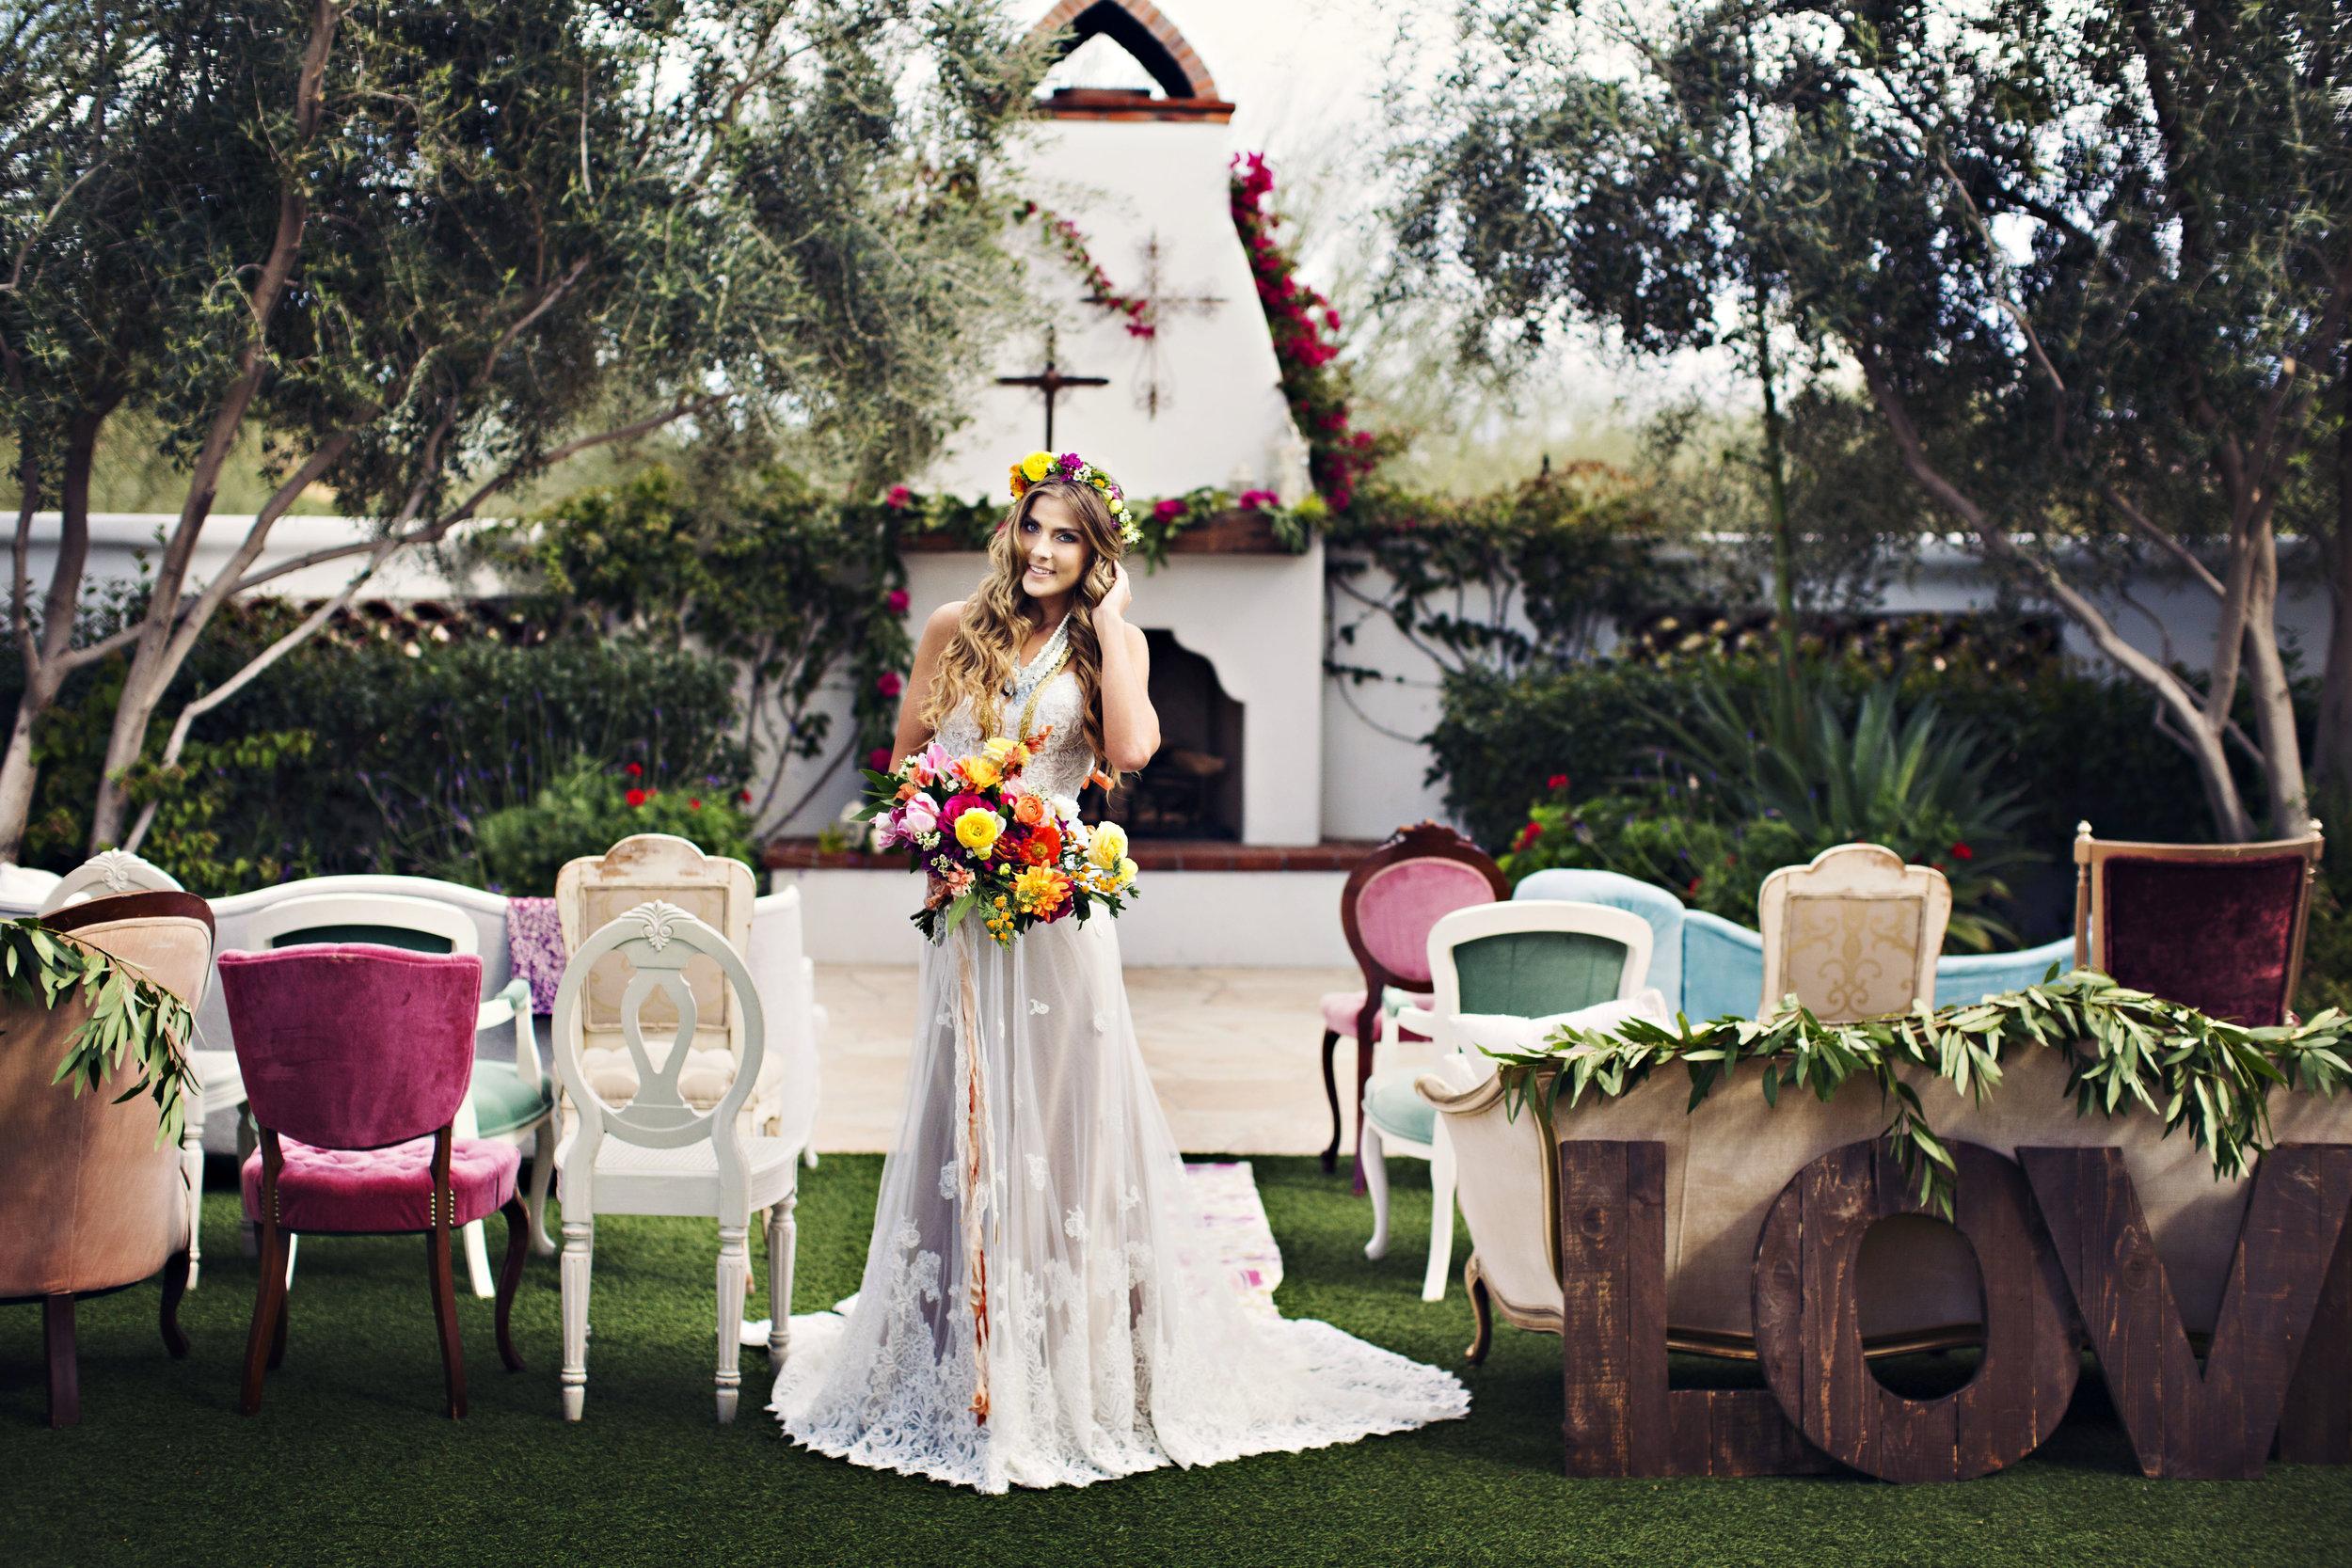 Phoenix - wedding- planner- el chorro_065.JPG